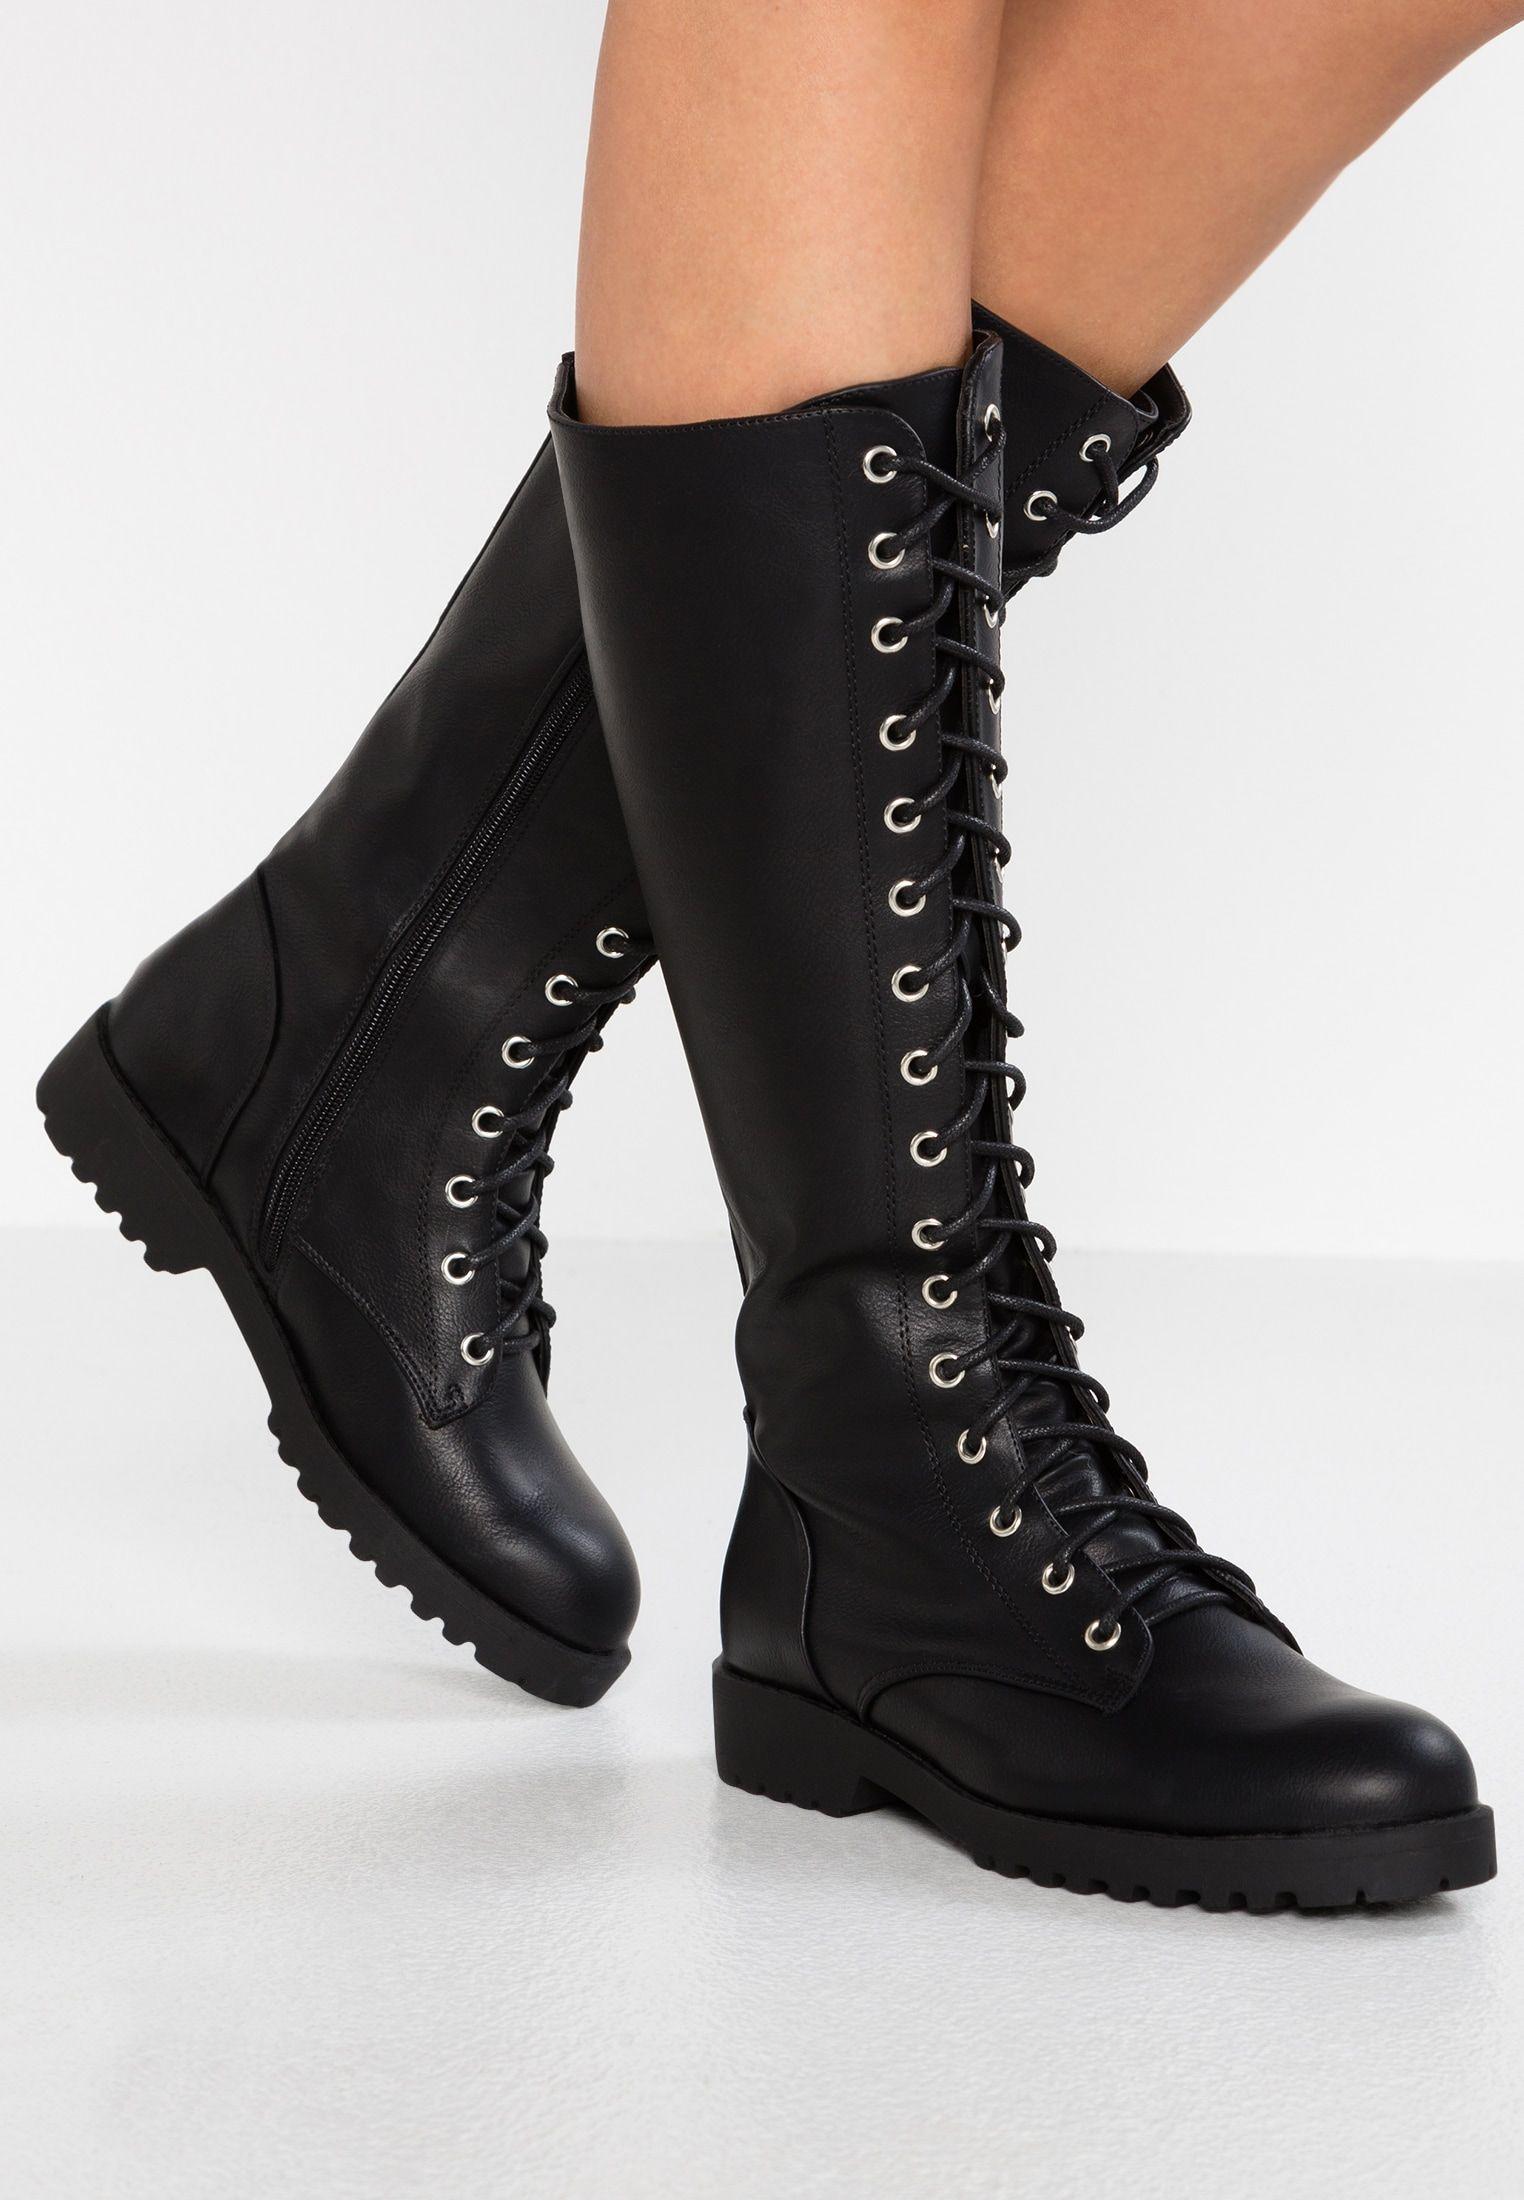 New Look Bravo Kozaki Sznurowane Black Zalando Pl Boots Black Boots Block Heel Shoes